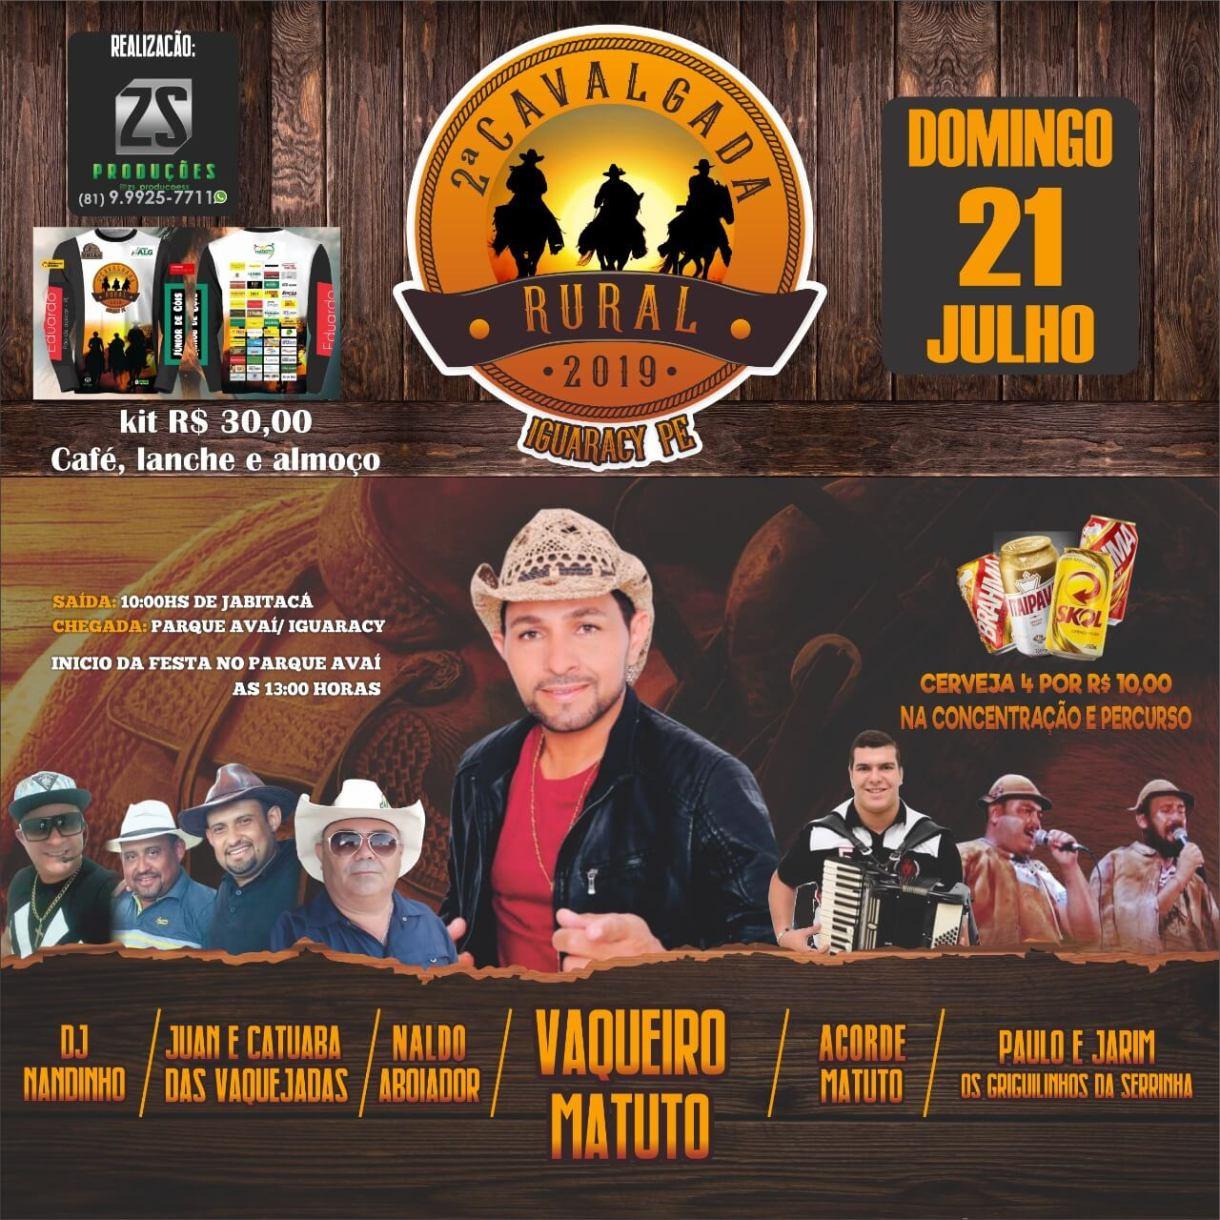 WhatsApp-Image-2019-07-04-at-23.20.22 Vem AÍ dia 21 de julho 2ª Cavalgada Cavalgada Rural de Iguaracy-PE